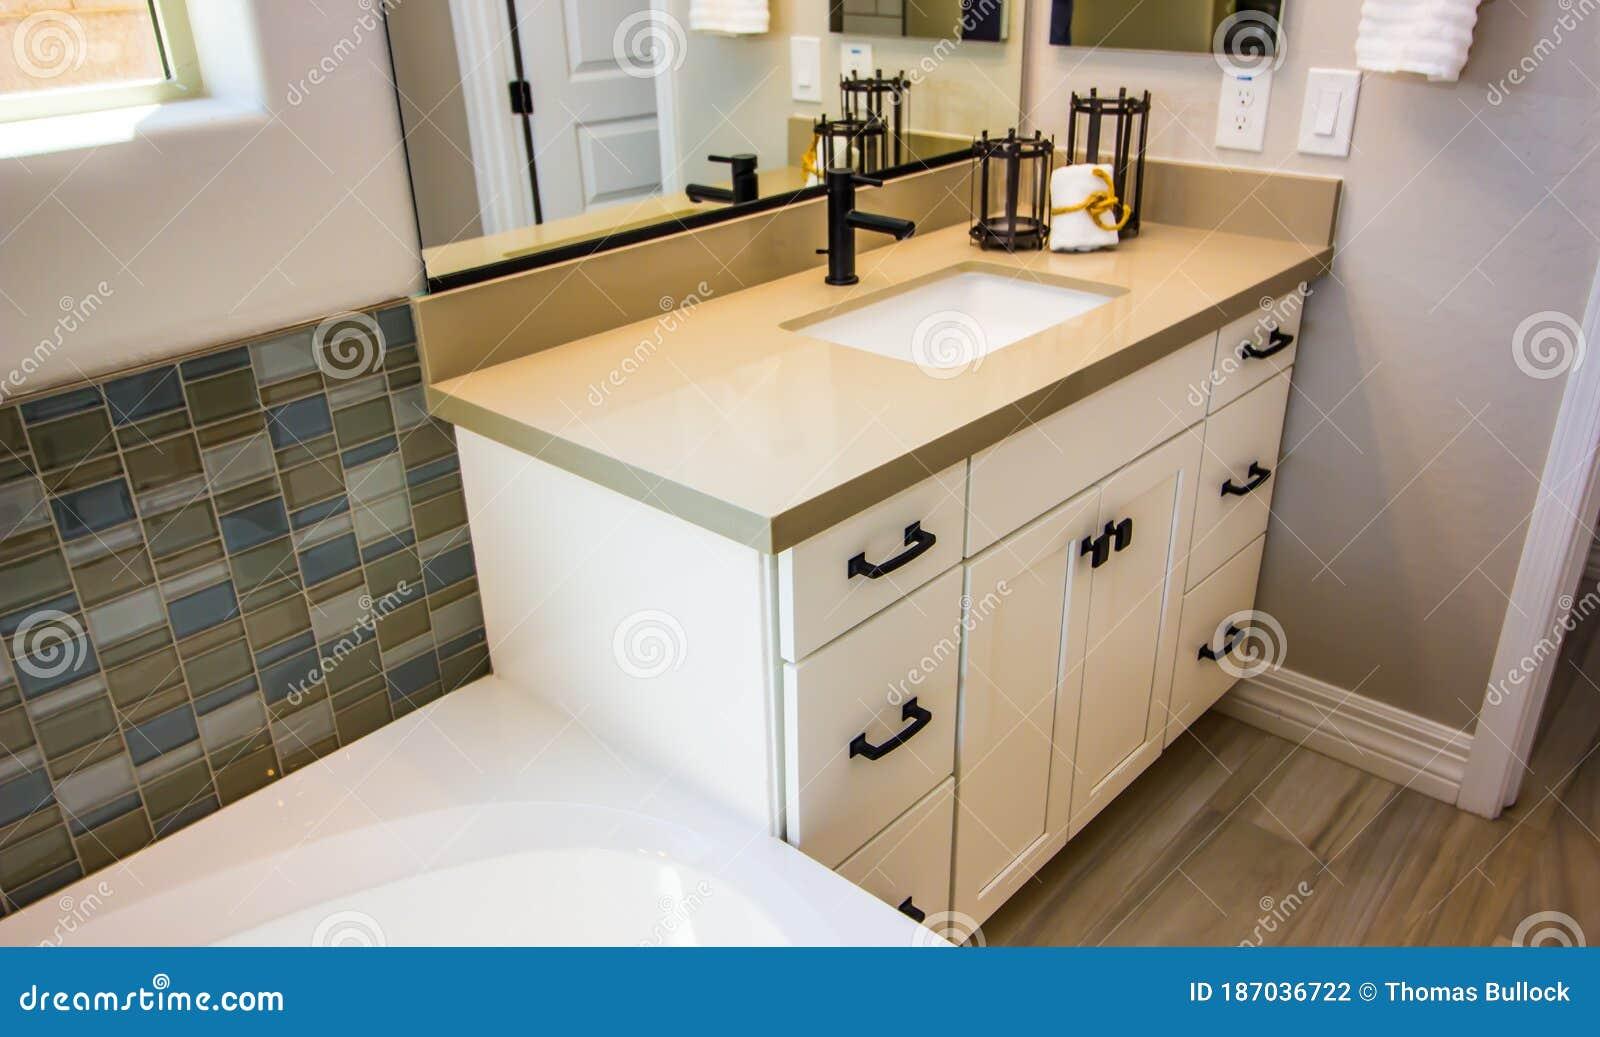 Modern Bathroom Vanity With Mirror Stock Photo Image Of Indoors Handles 187036722